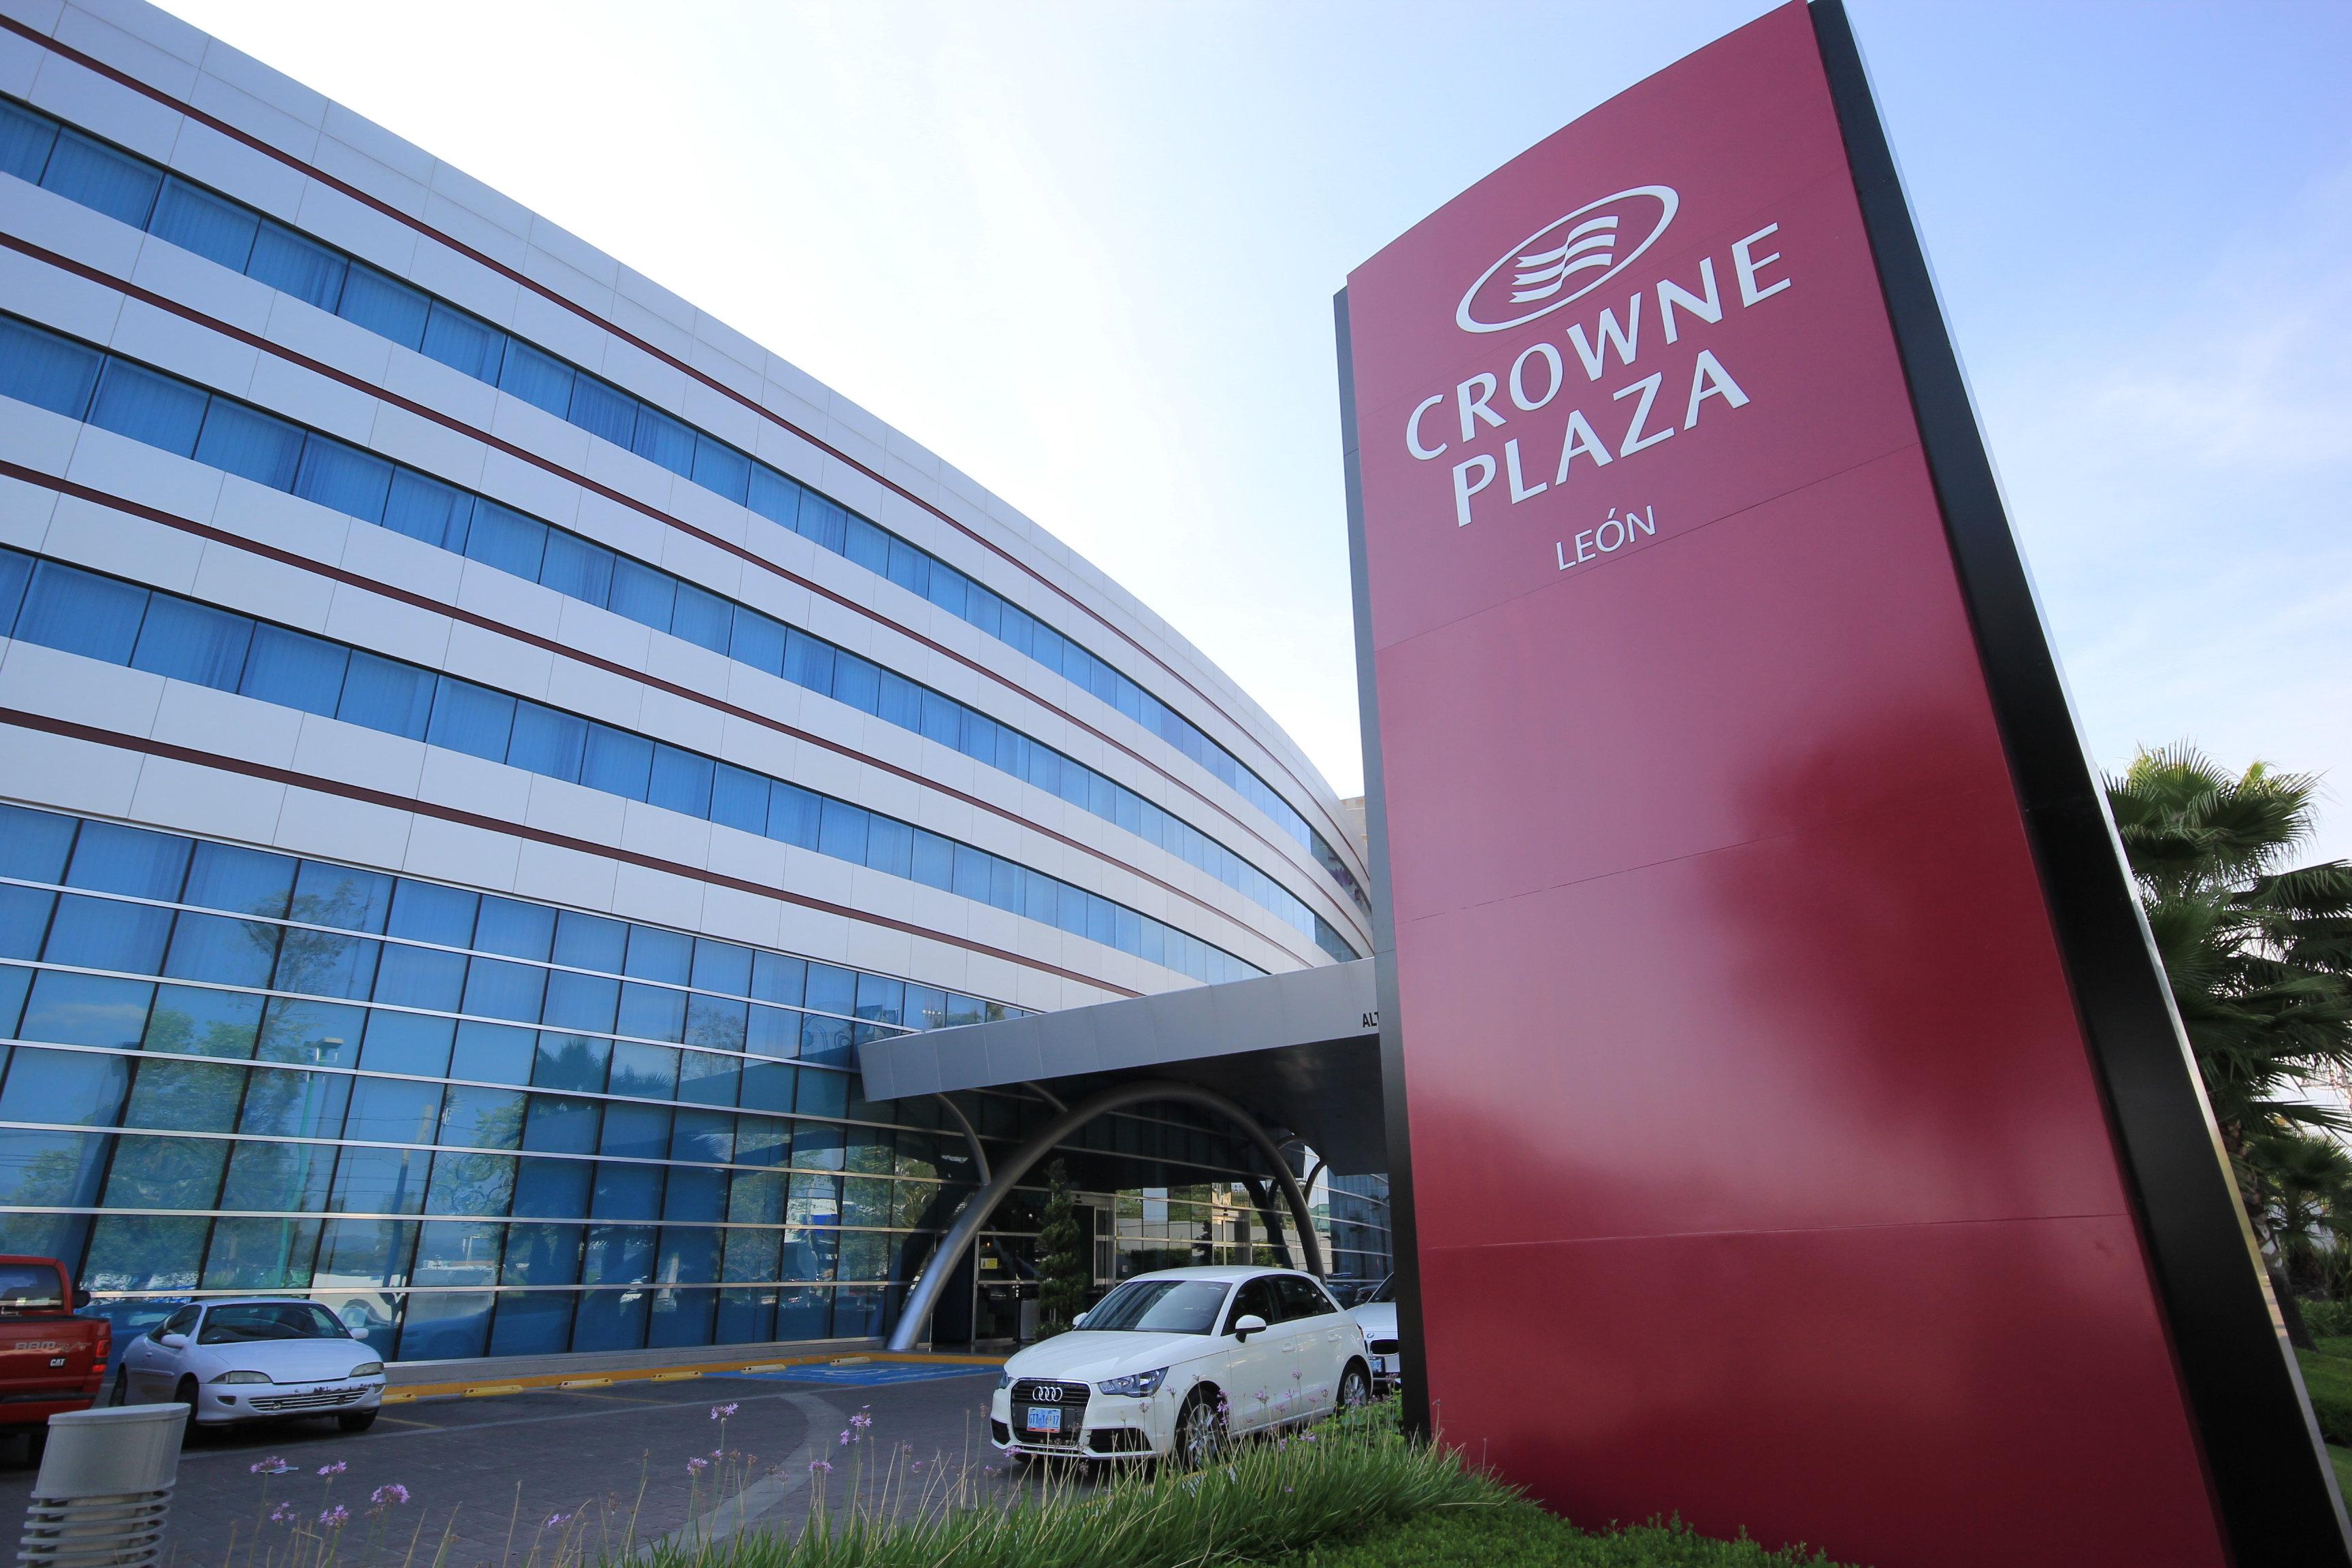 Crowne Plaza Hotel Leon Gto